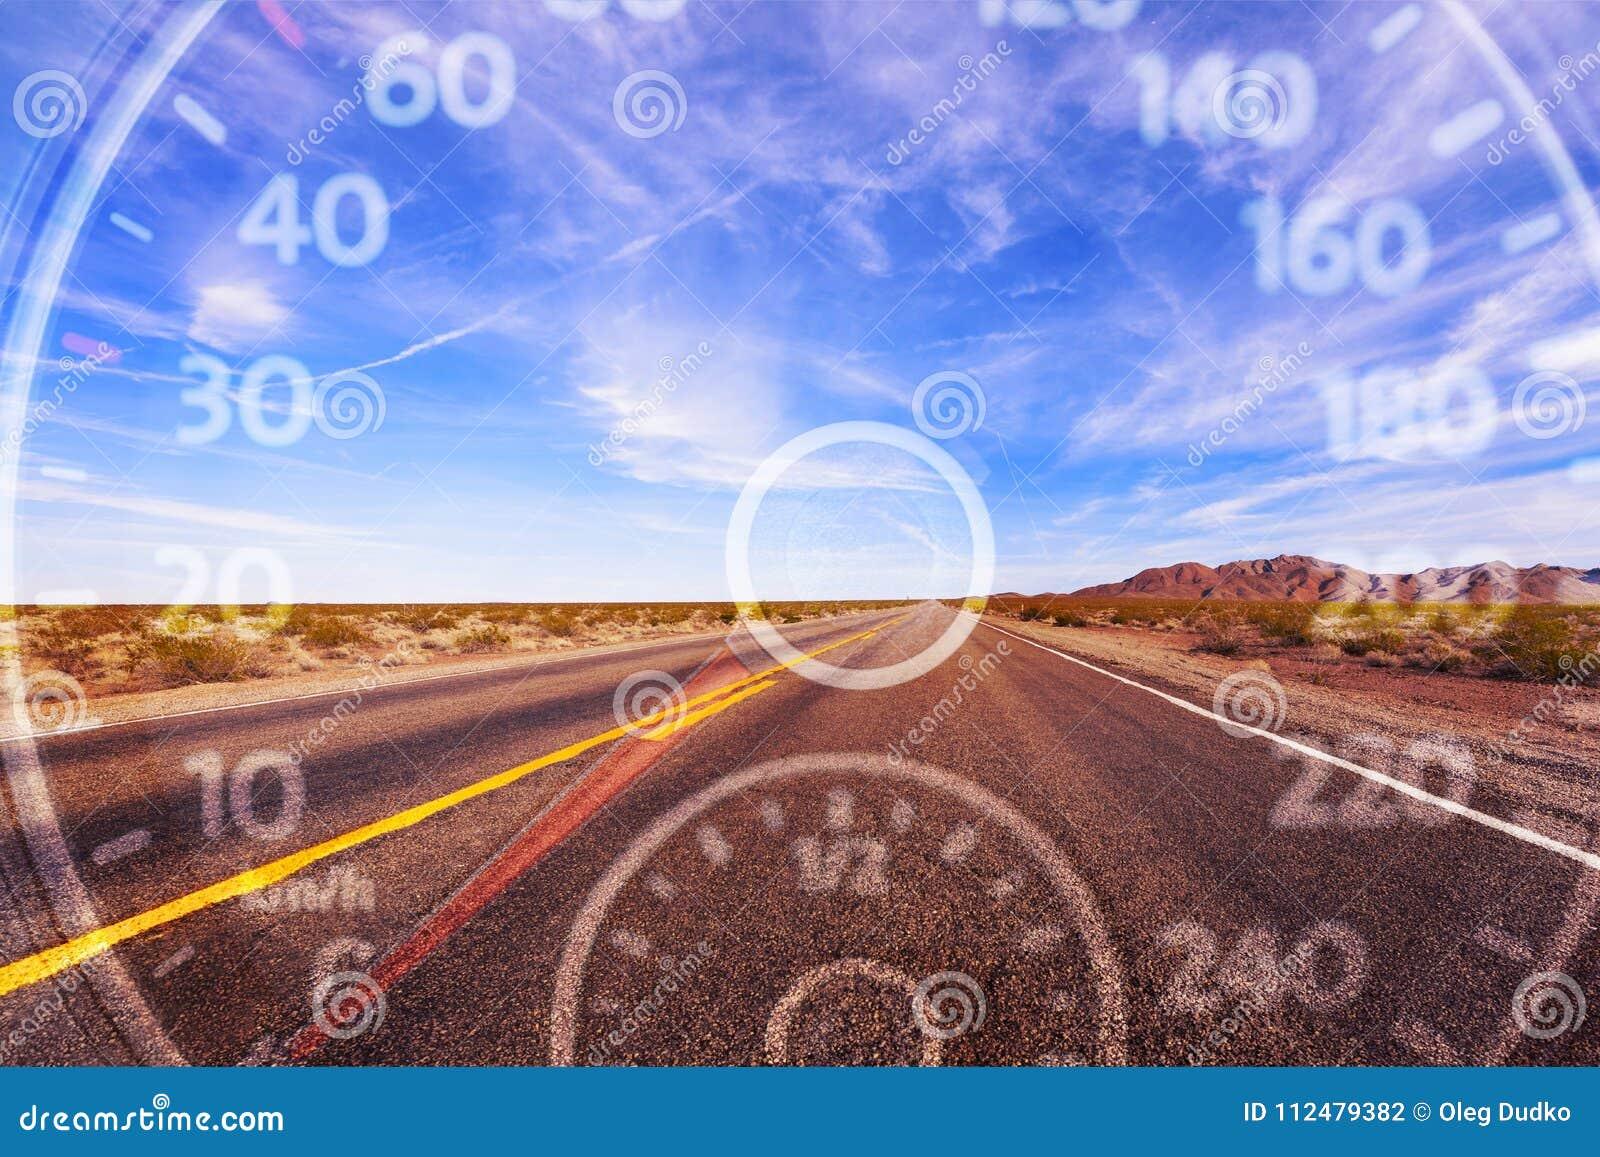 Modern car speedometer on road background